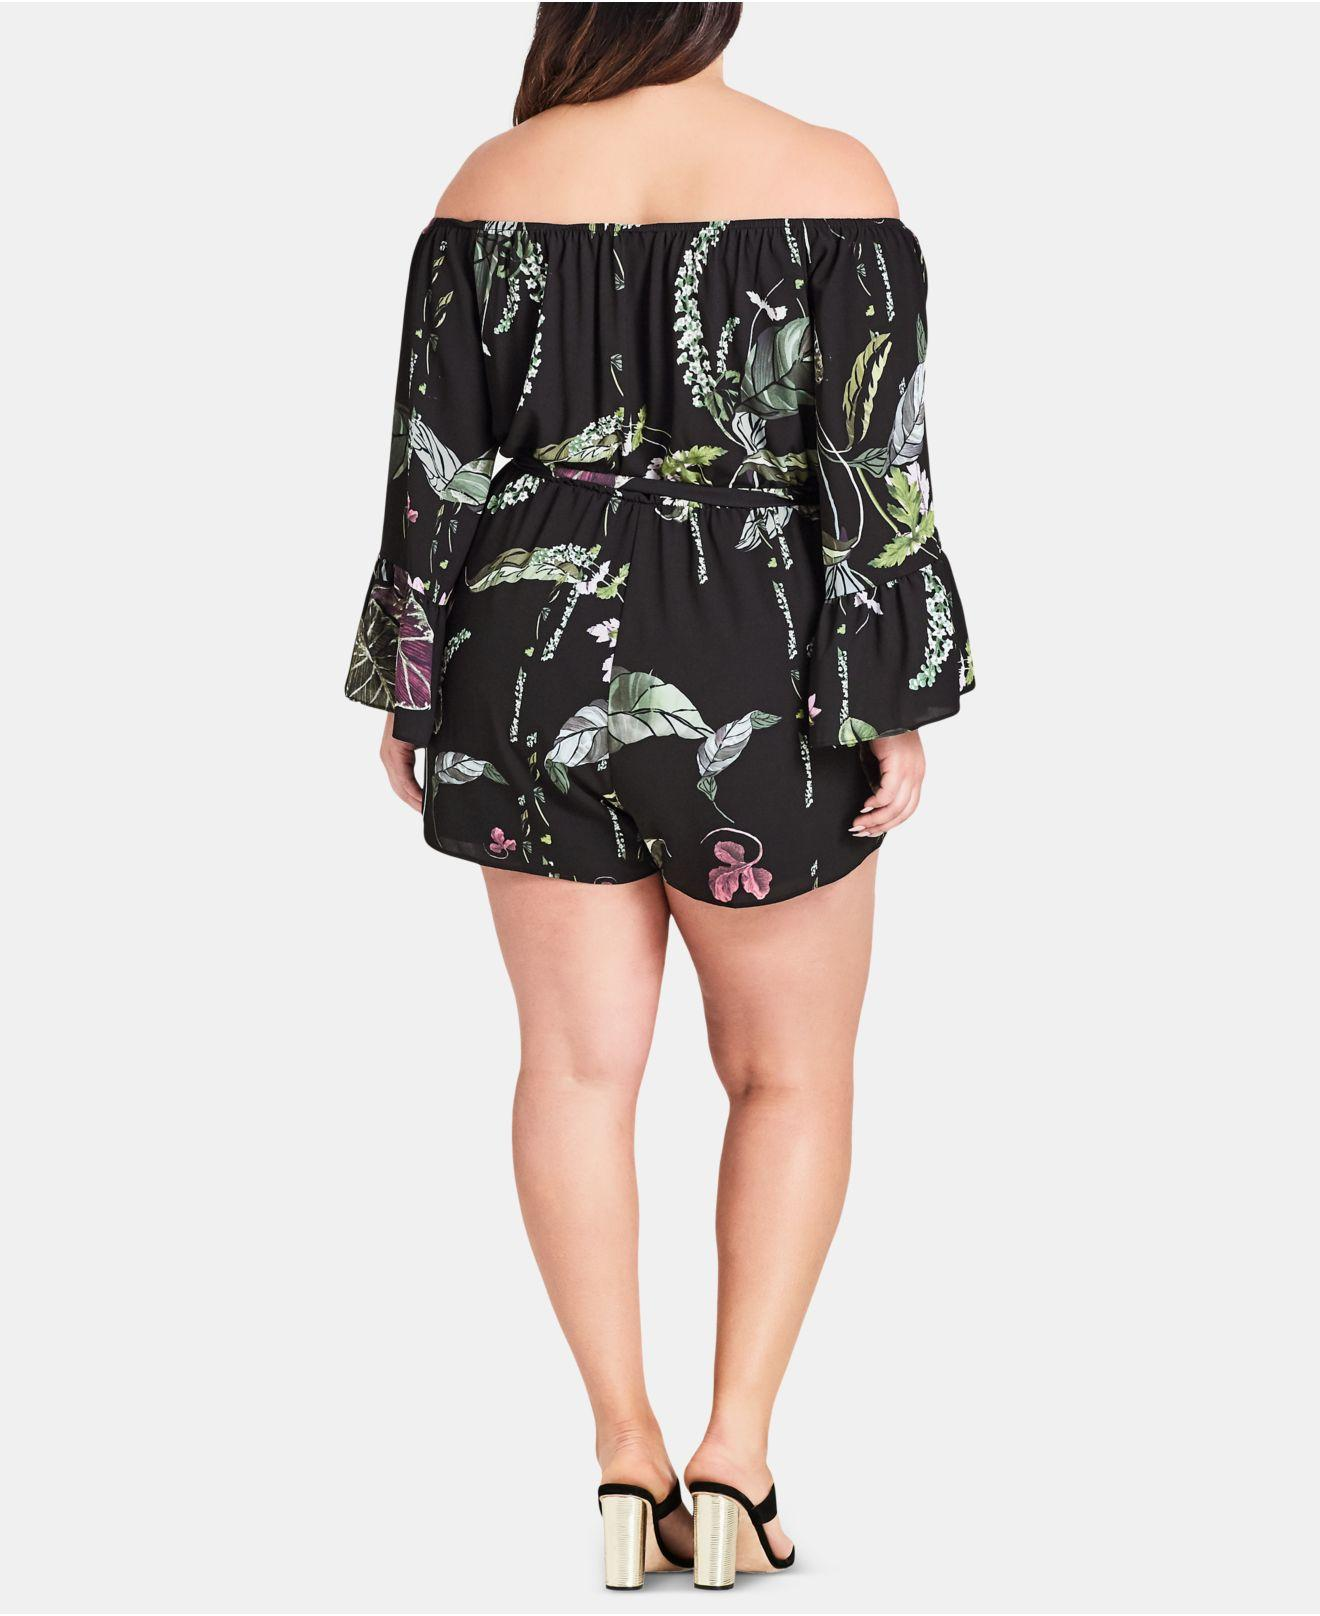 49513dd57d Lyst - City Chic Trendy Plus Size Lily Pad Romper in Black